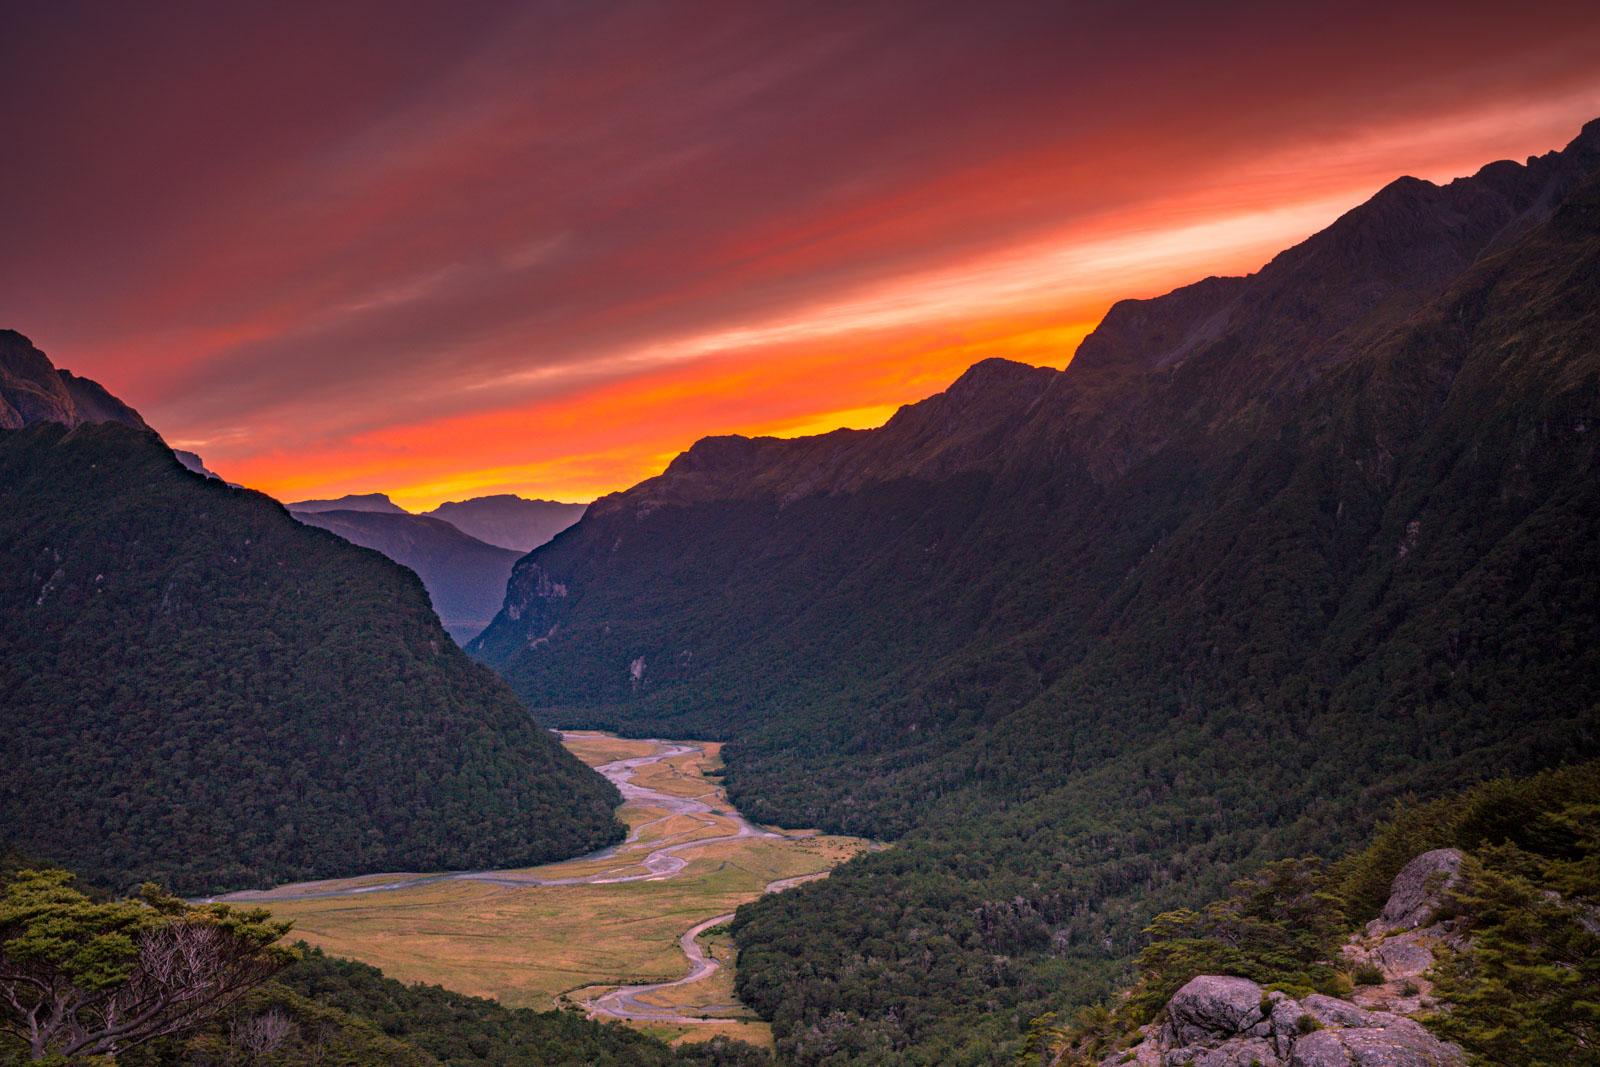 Sunrise from Routeburn Falls Hut